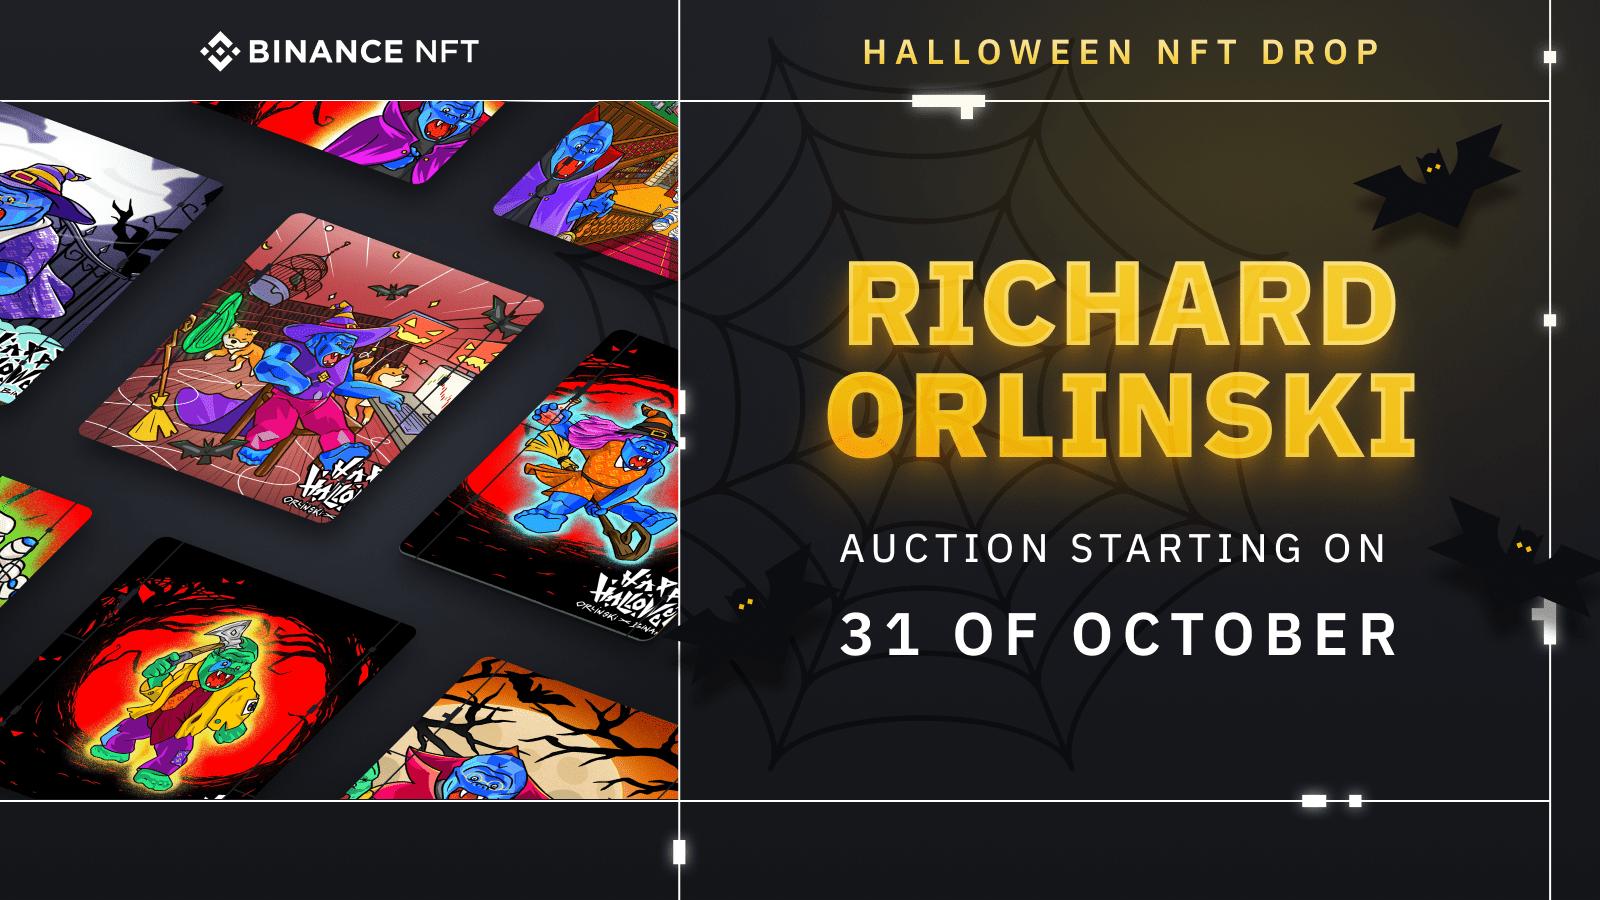 Binance NFT: Exclusive Orlinski x Binance Halloween Auction